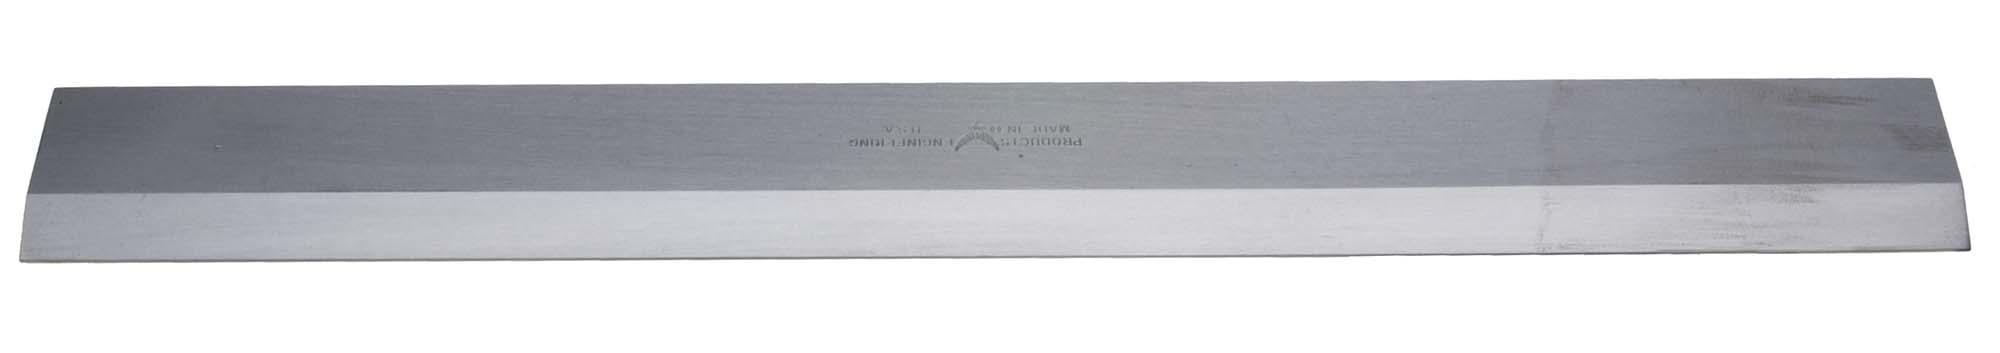 "PEC Tools 4800-012B 12"" Beveled Straight Edge"